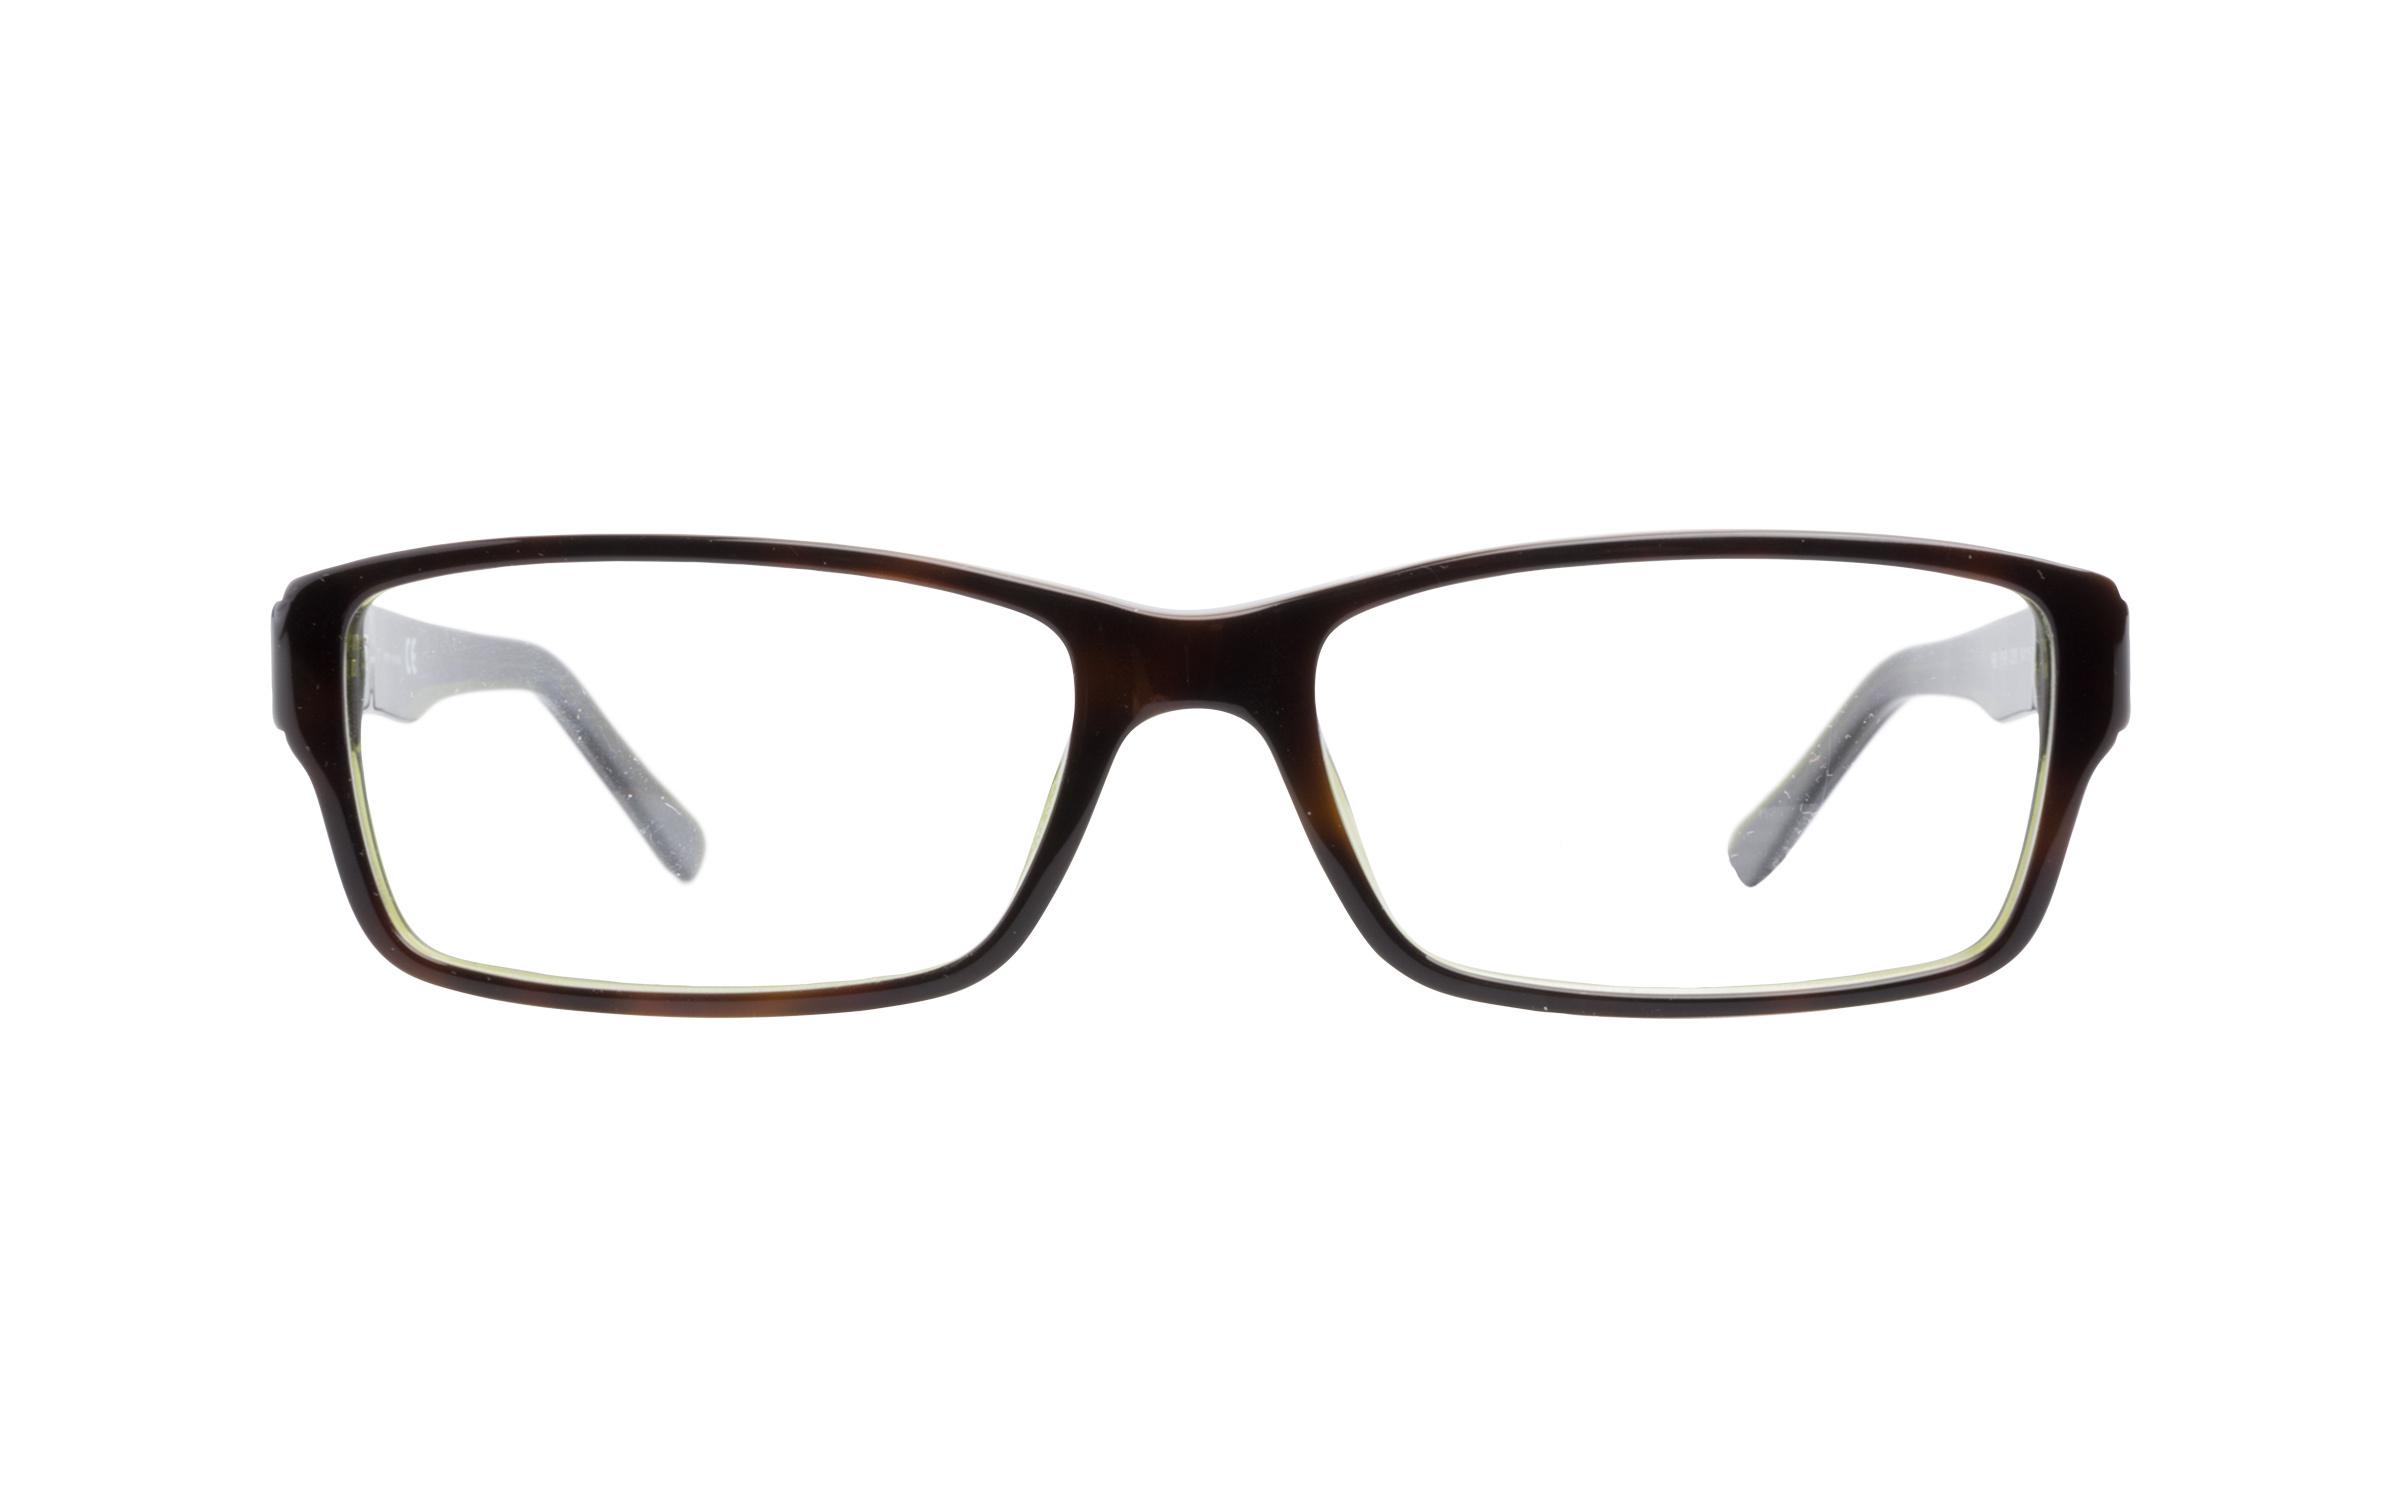 Luxottica Ray-Ban RB5169 2383 Eyeglasses and Frame in Top Havana Brown/Green/Tortoise | Acetate - Online